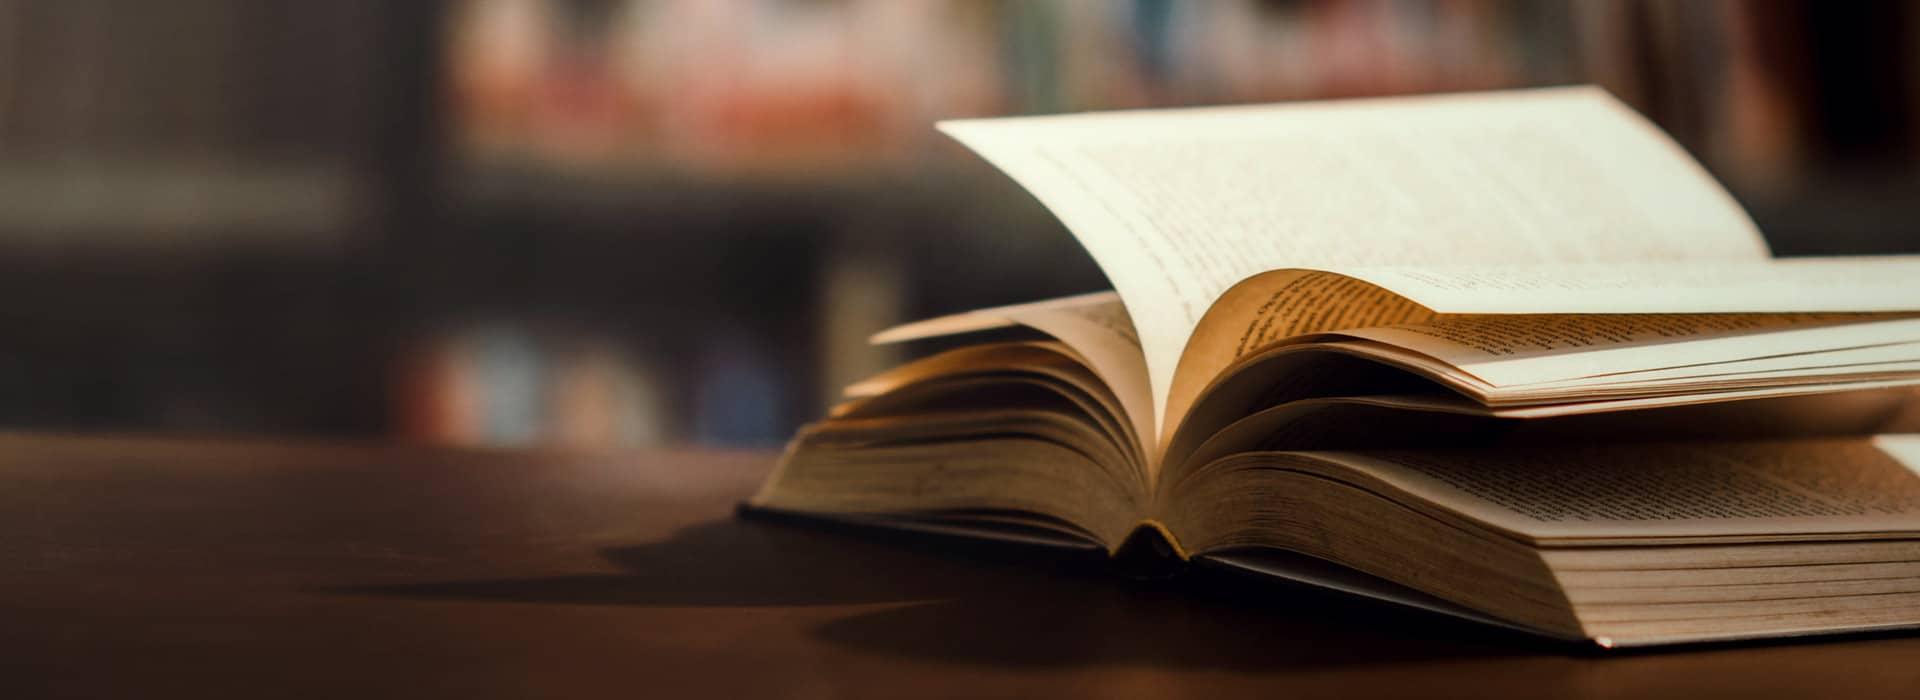 Oposiciones de Auxiliar Bibliotecas Archivo 2020-2021